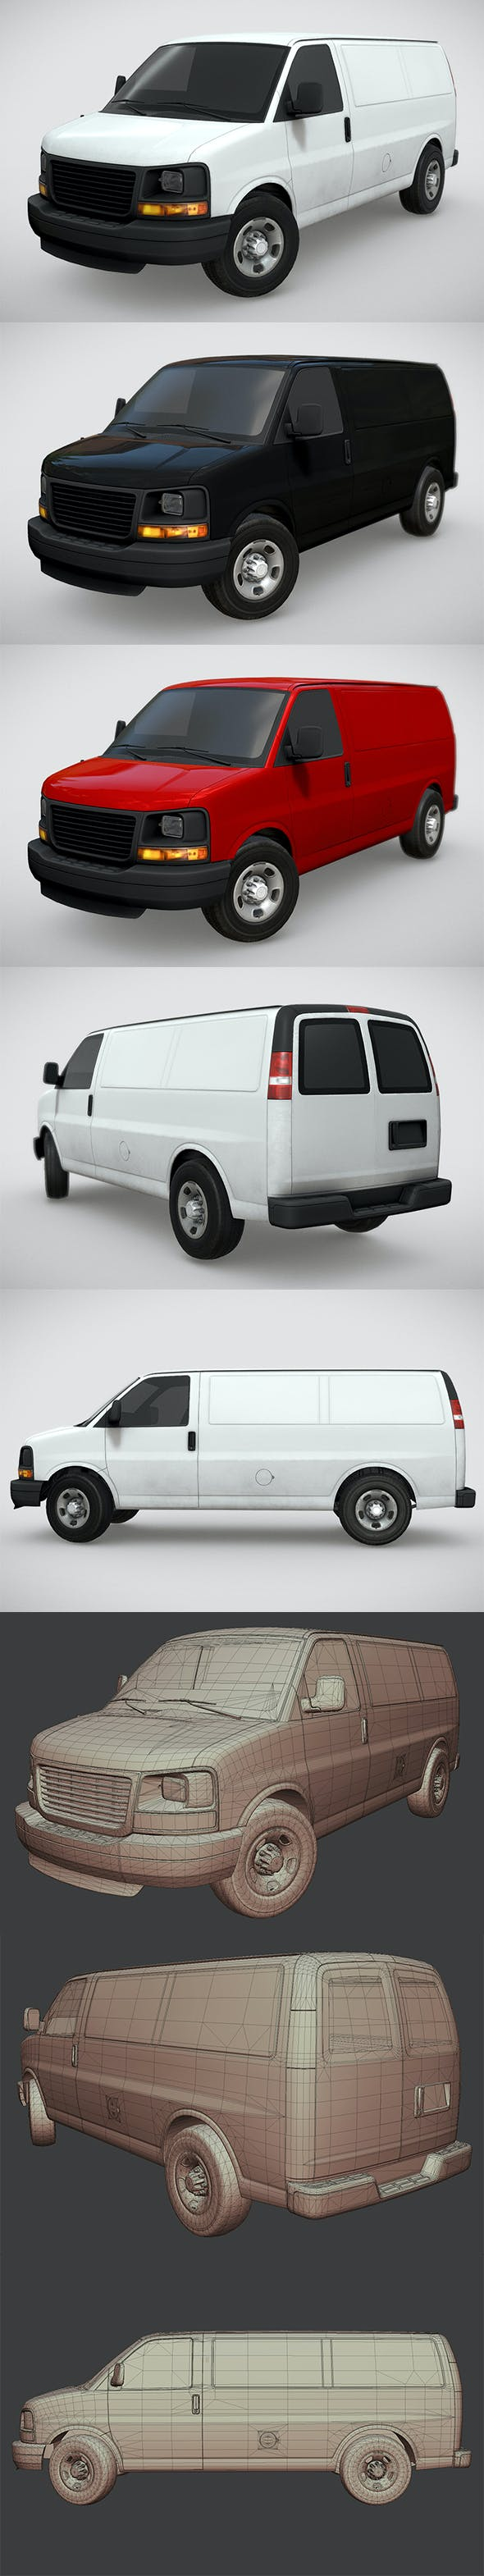 GMC Savana Van 2014 - 3DOcean Item for Sale